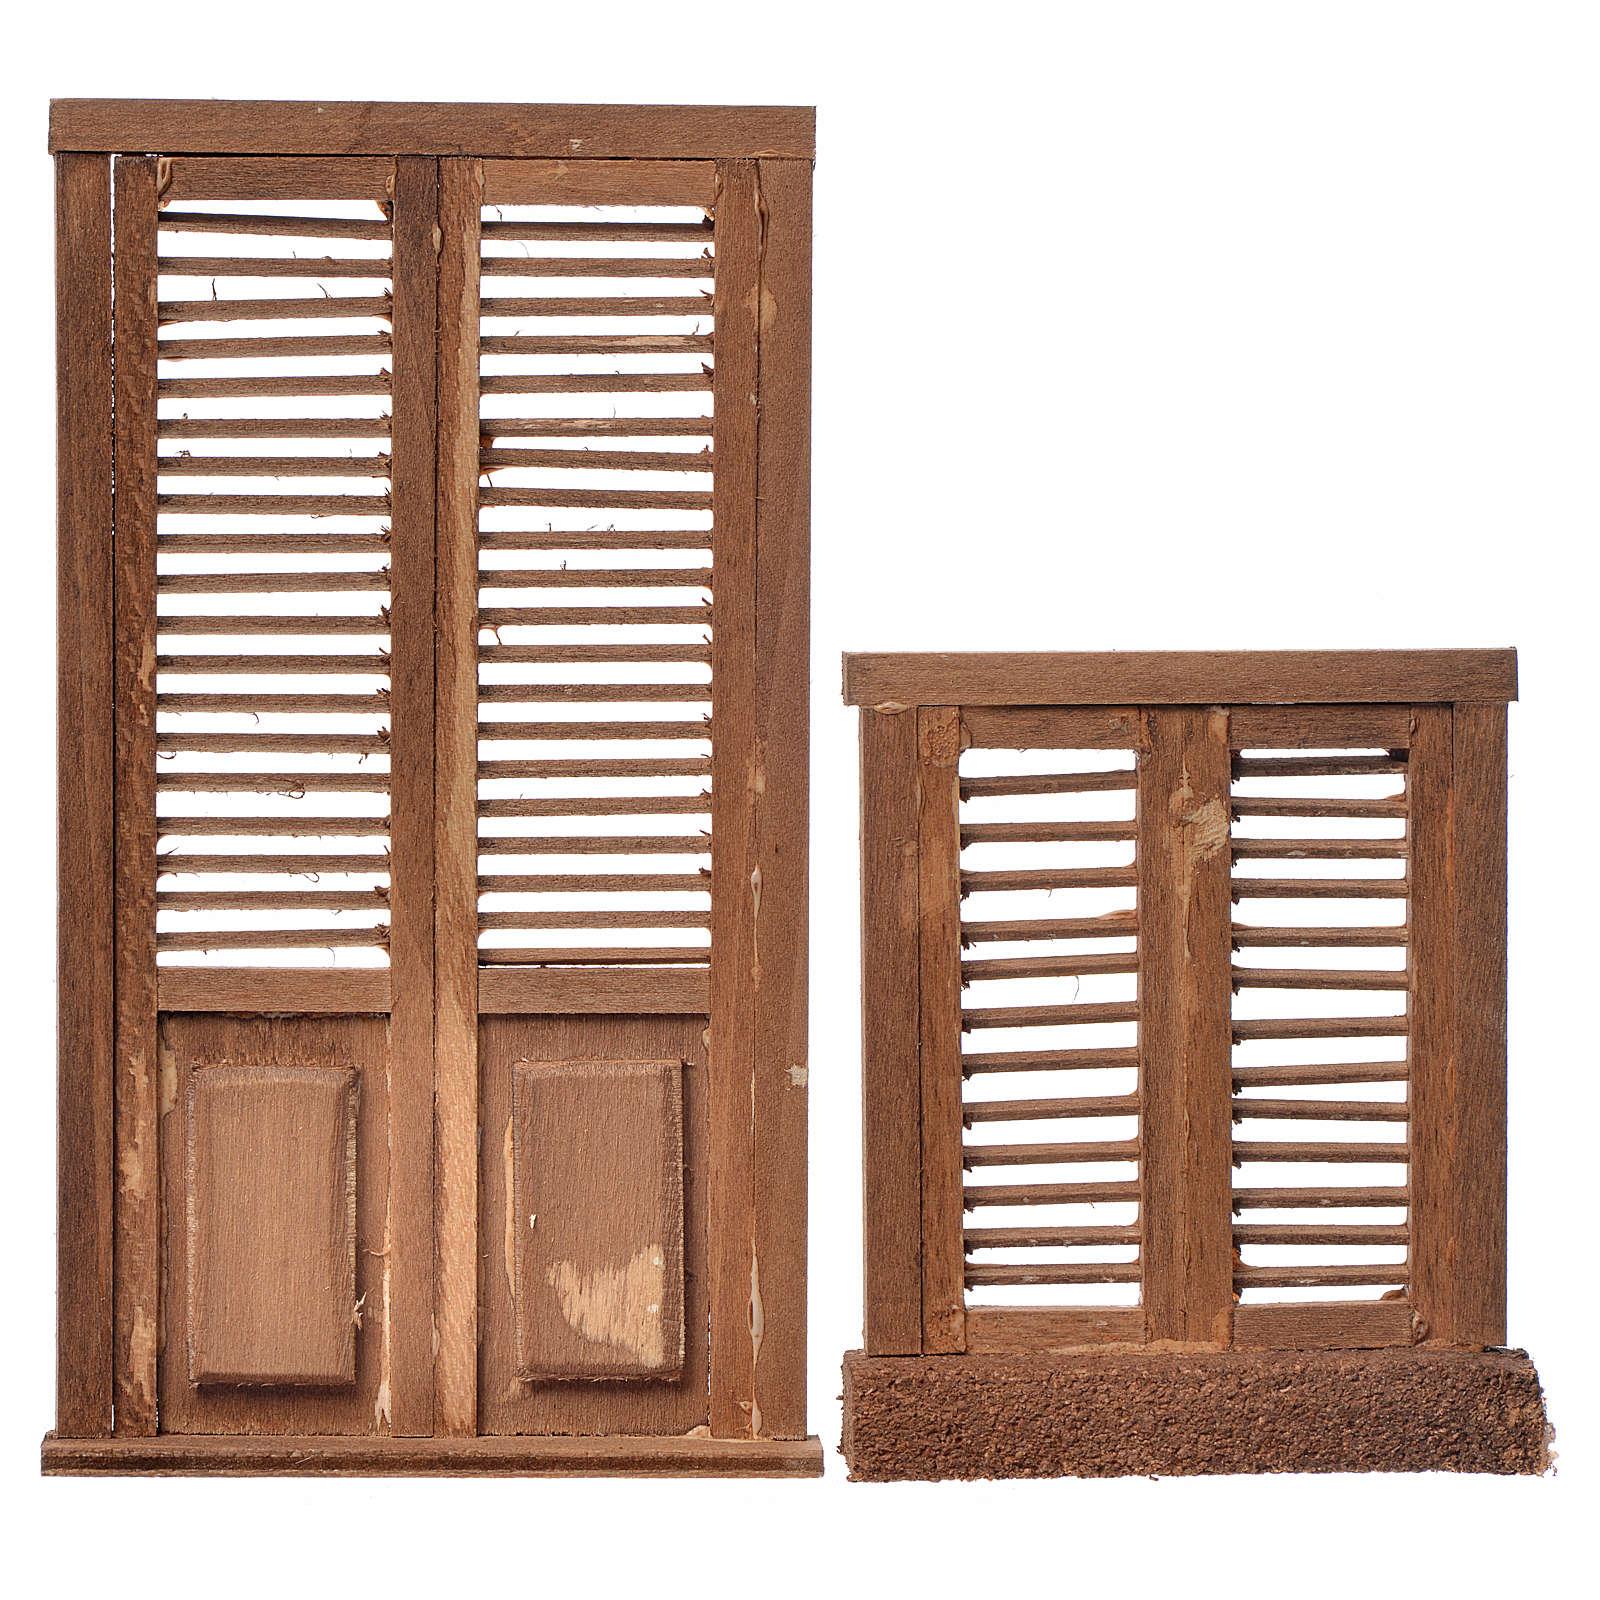 Infissi presepe 2 pz legno tipo veneziana 13,5x7,5 e 8x7 4